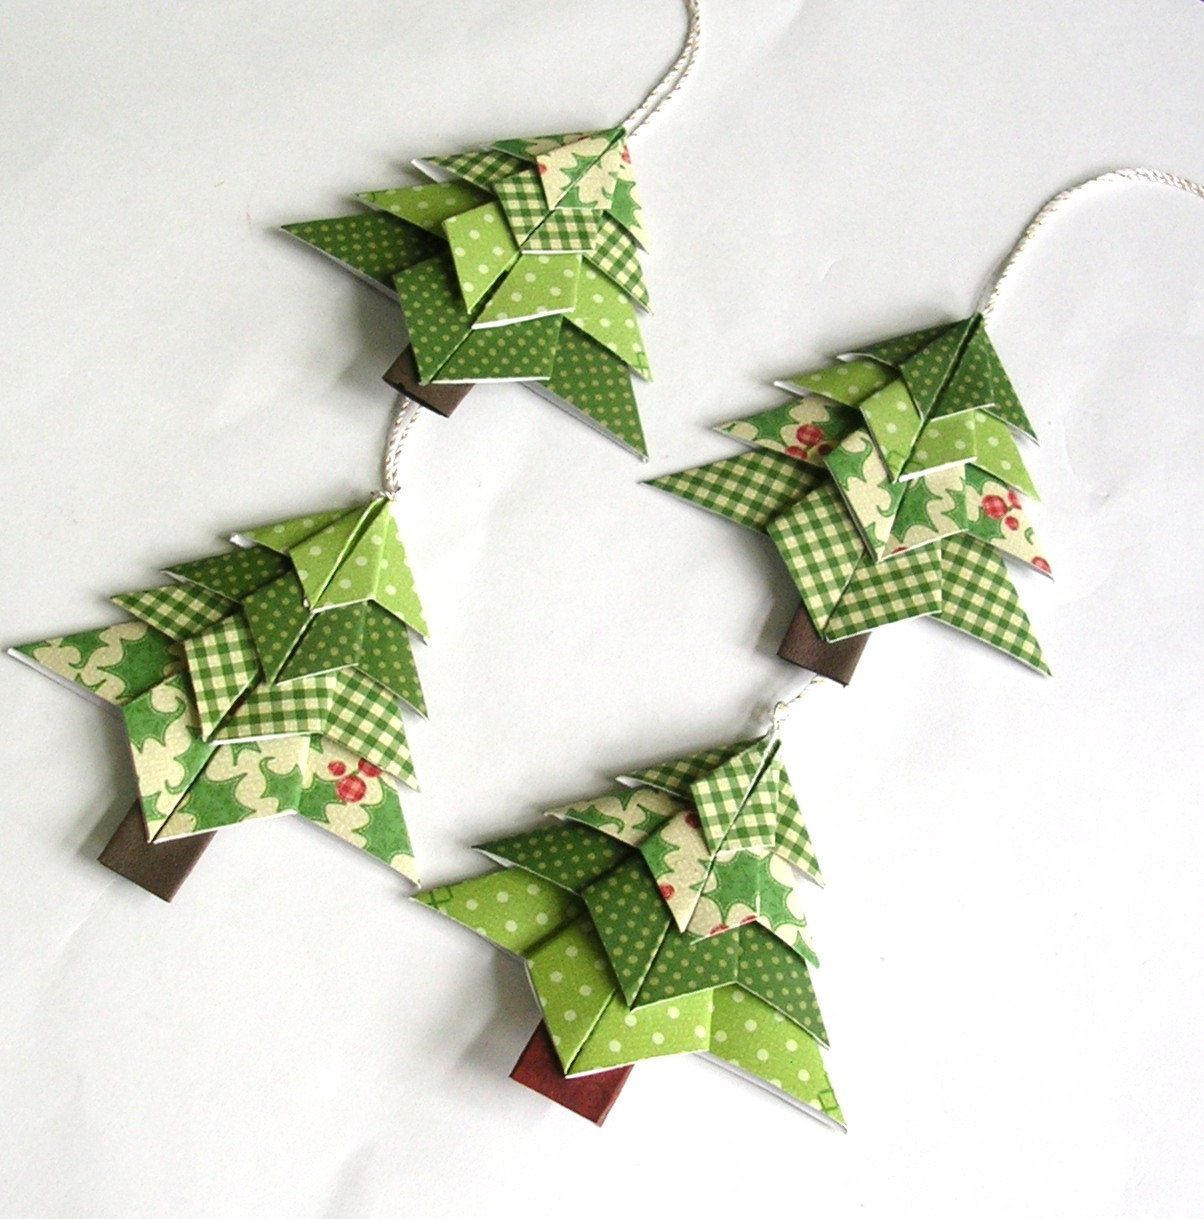 Selber machen origamiweihnachten christmas ornament ornament